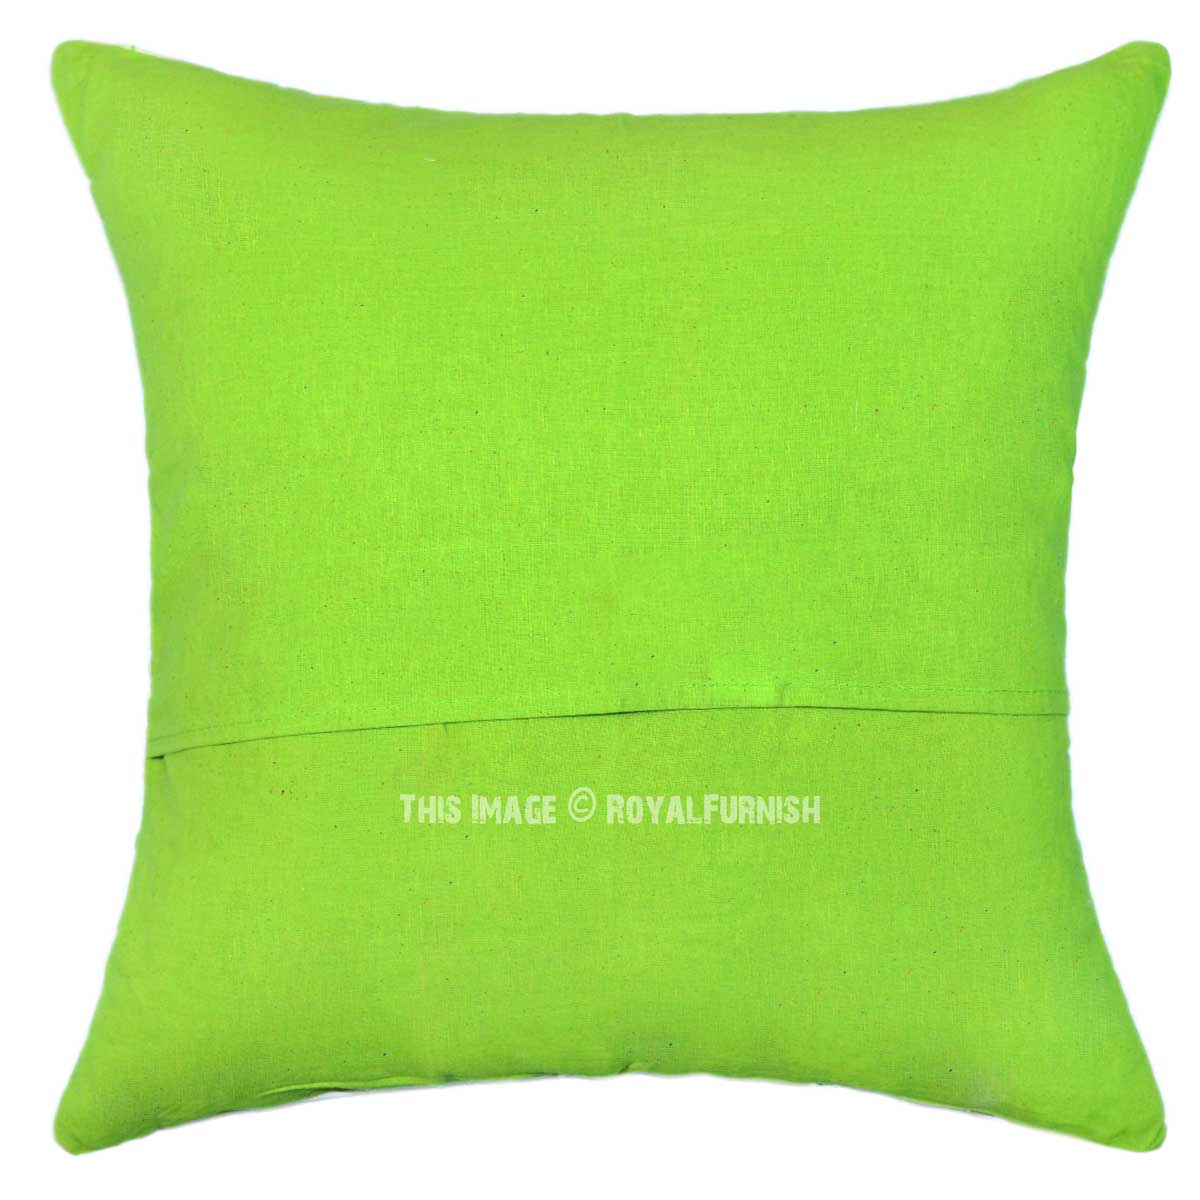 16 x 16 parrot green decorative zig zag ikat throw pillow cover. Black Bedroom Furniture Sets. Home Design Ideas